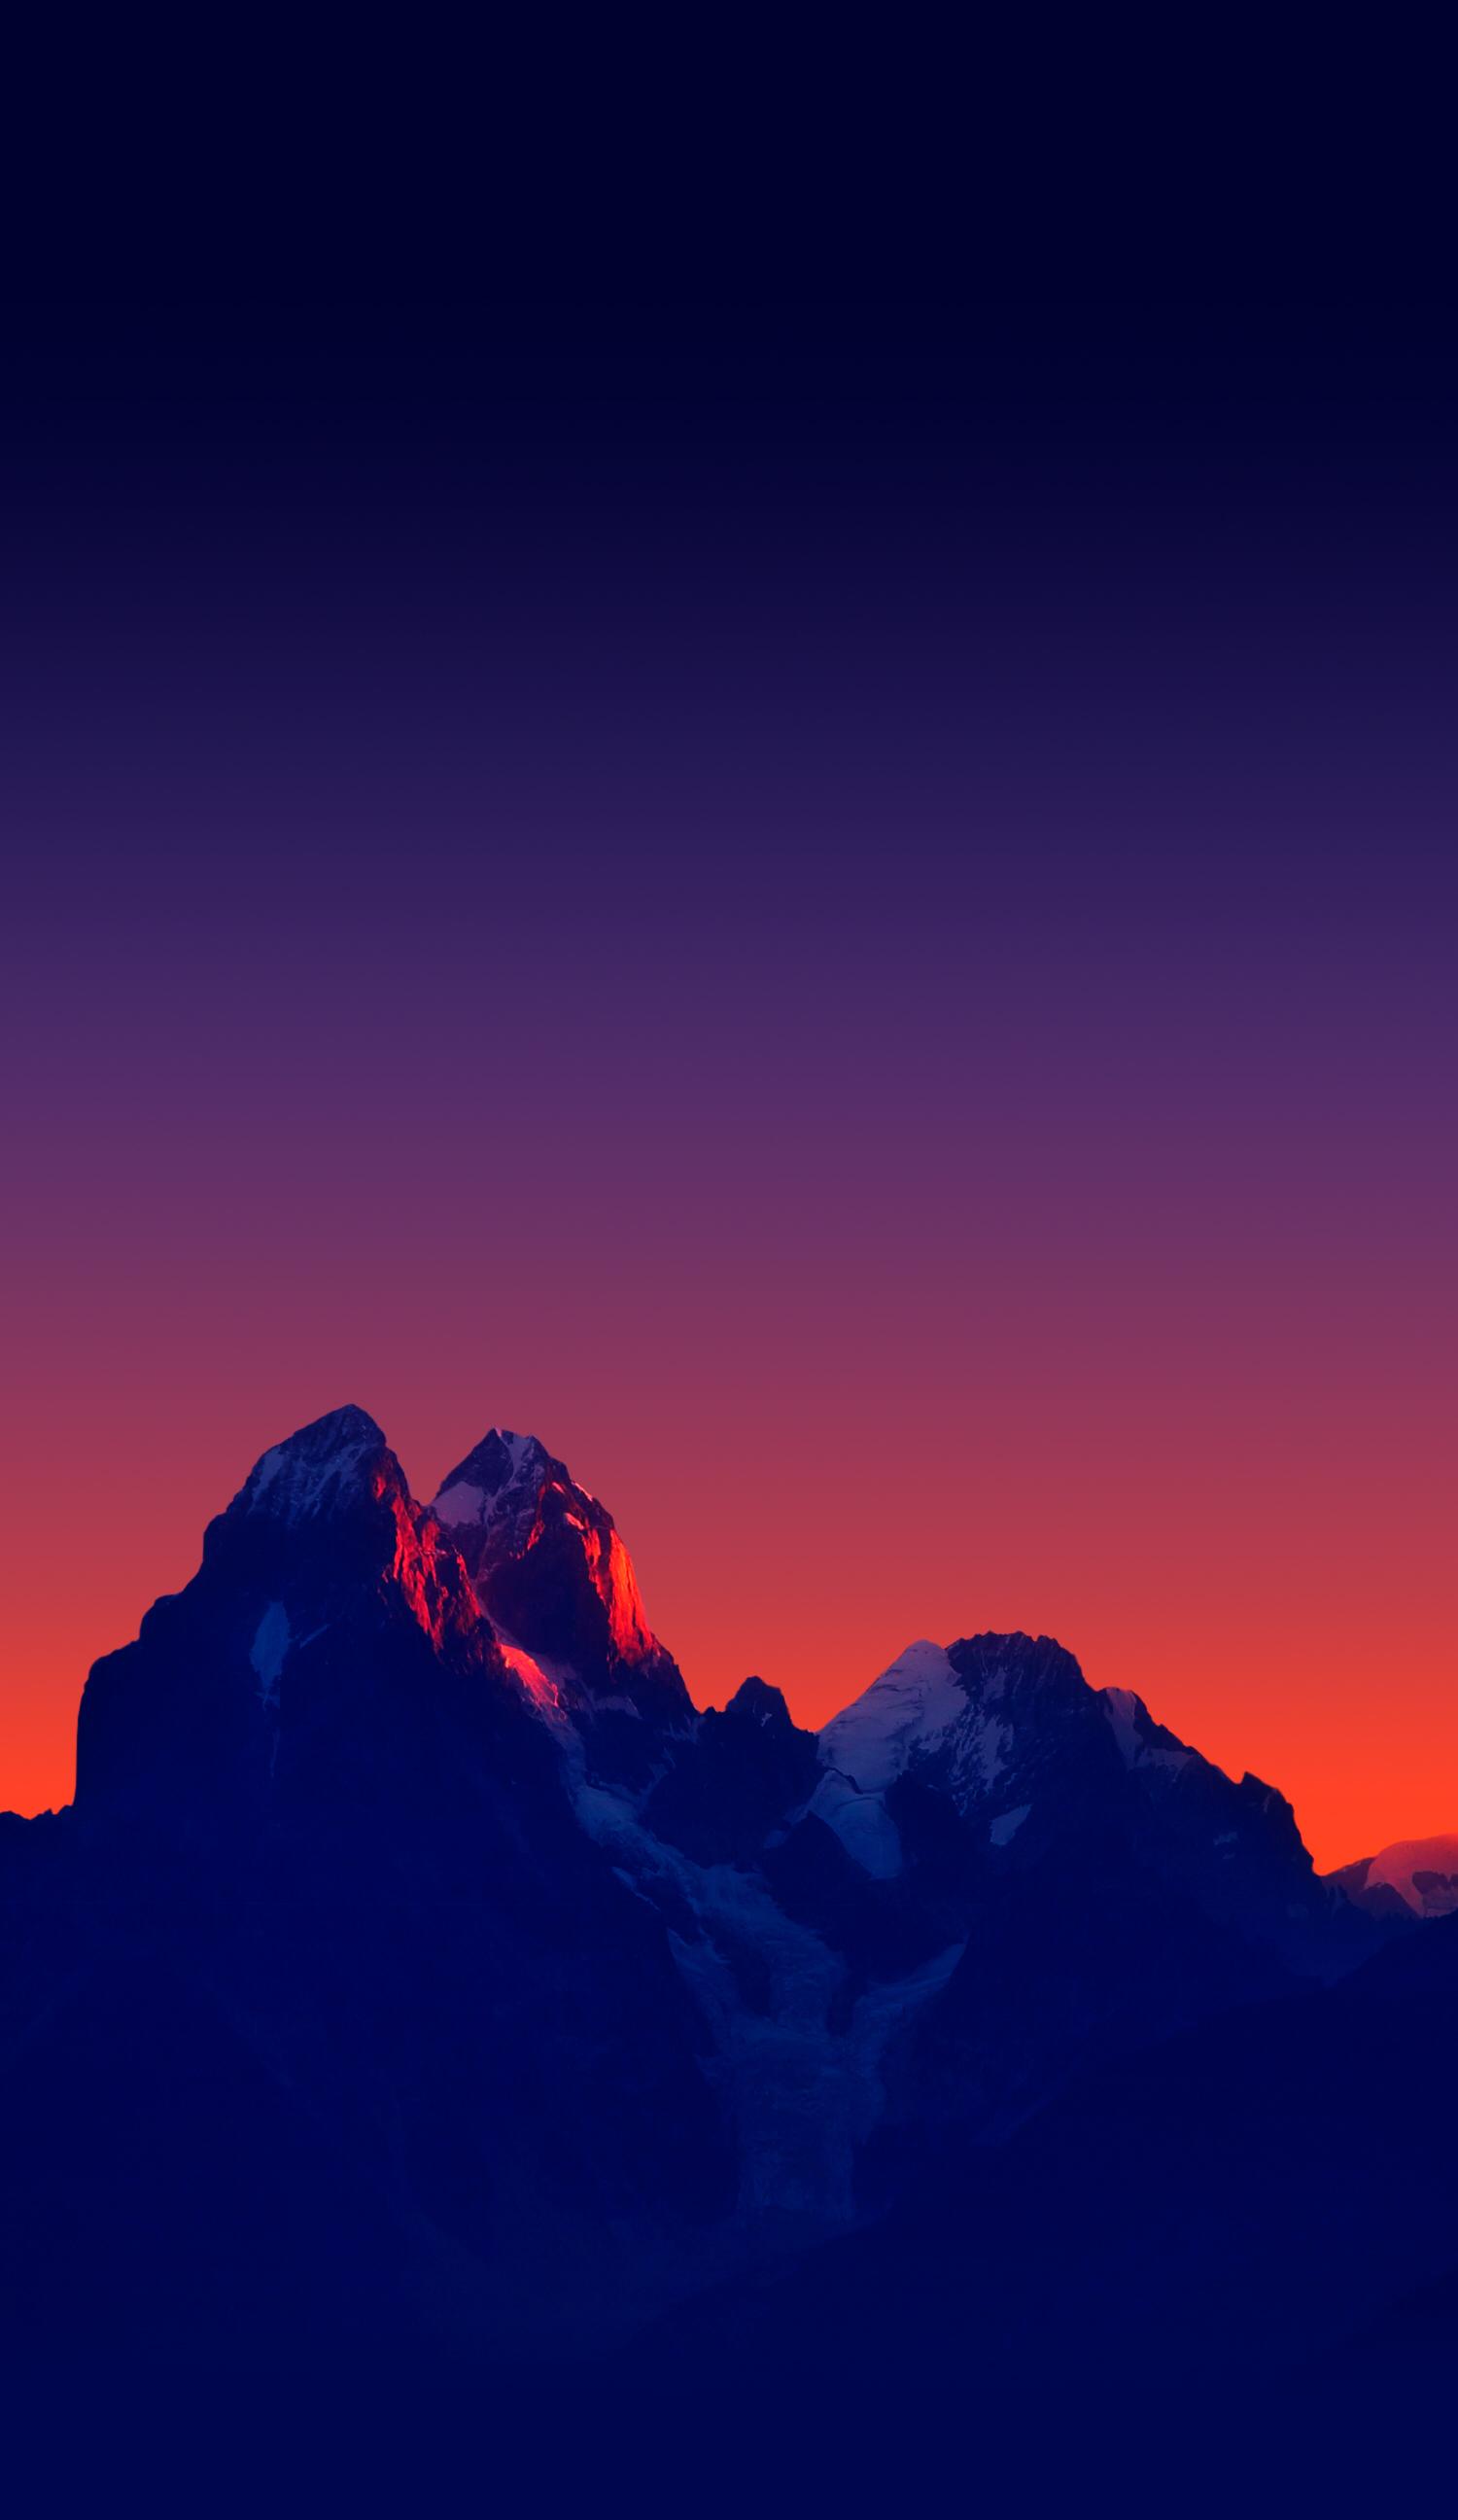 Navy blue mountains Sunset iphone wallpaper, Landscape